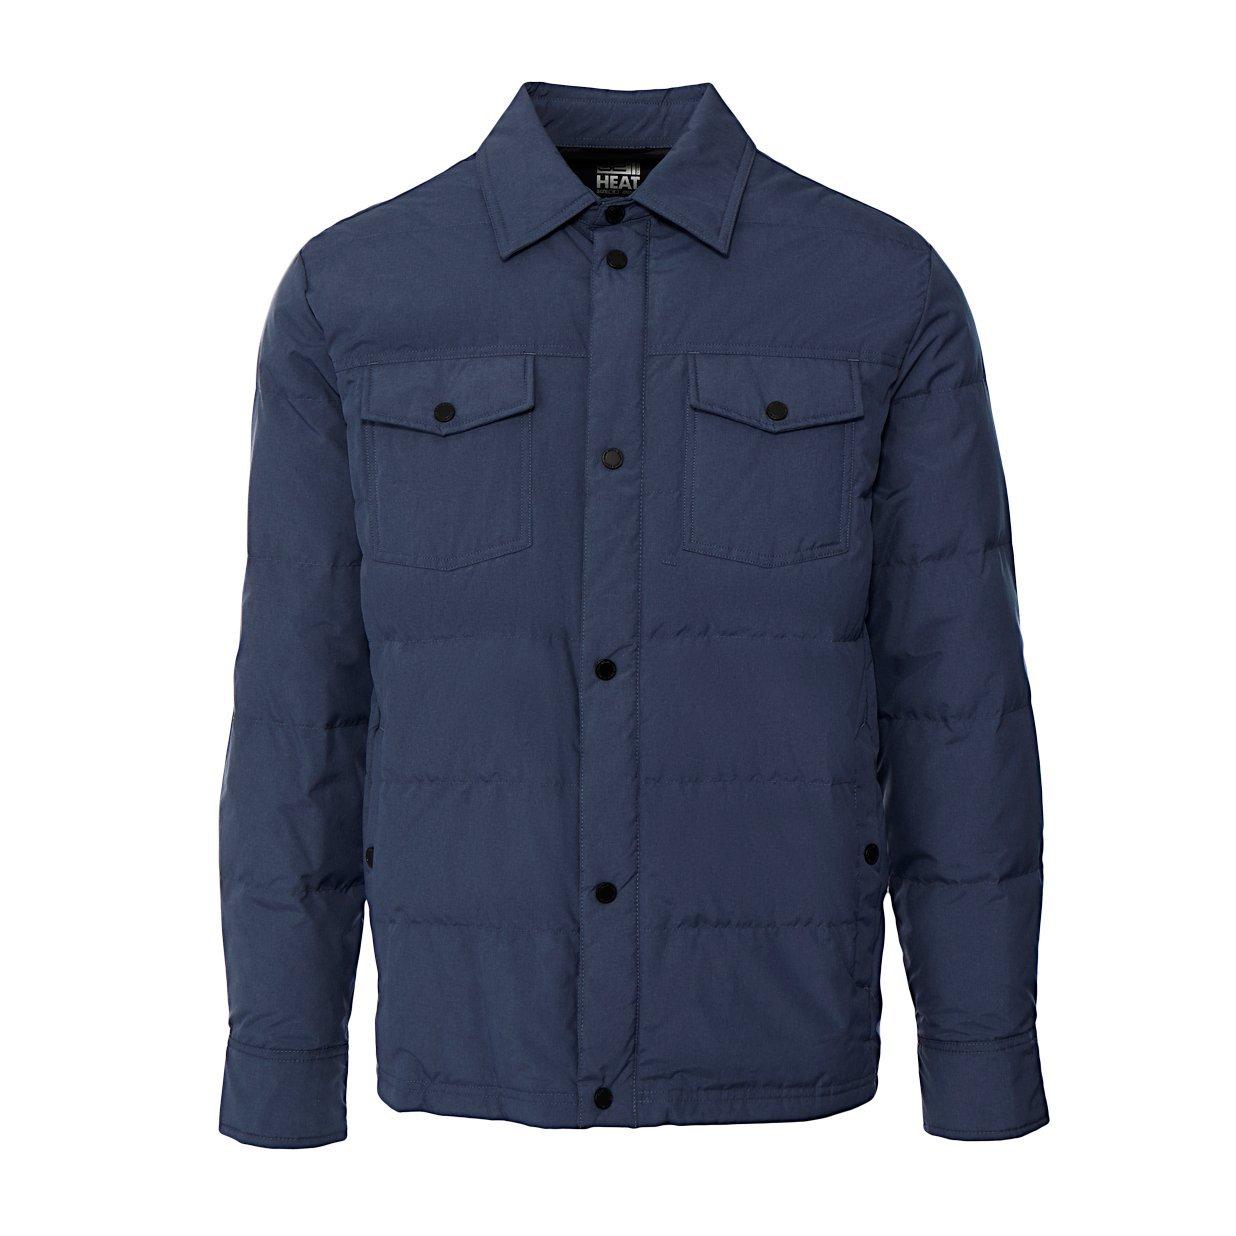 32 DEGREES Men's Packable Down Shirt Jacket -Dark Denim-M by 32 DEGREES